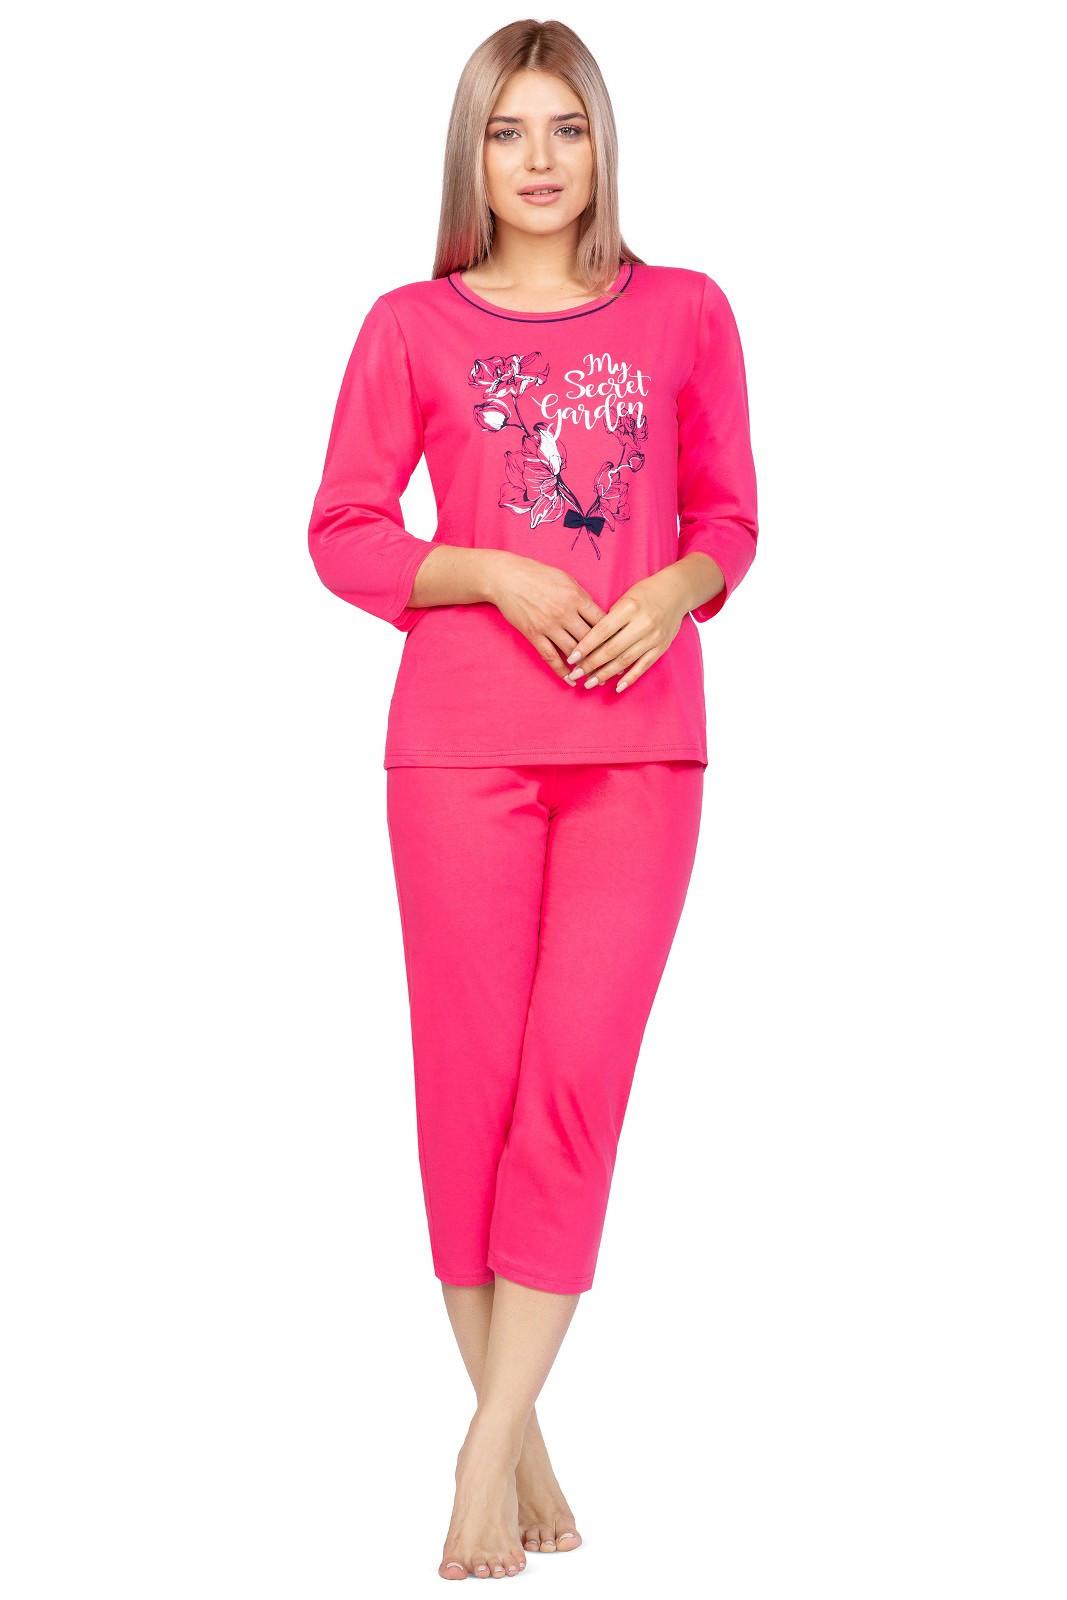 Dámske pyžamo Regina 972 3/4 2XL-4XL malina 3XL